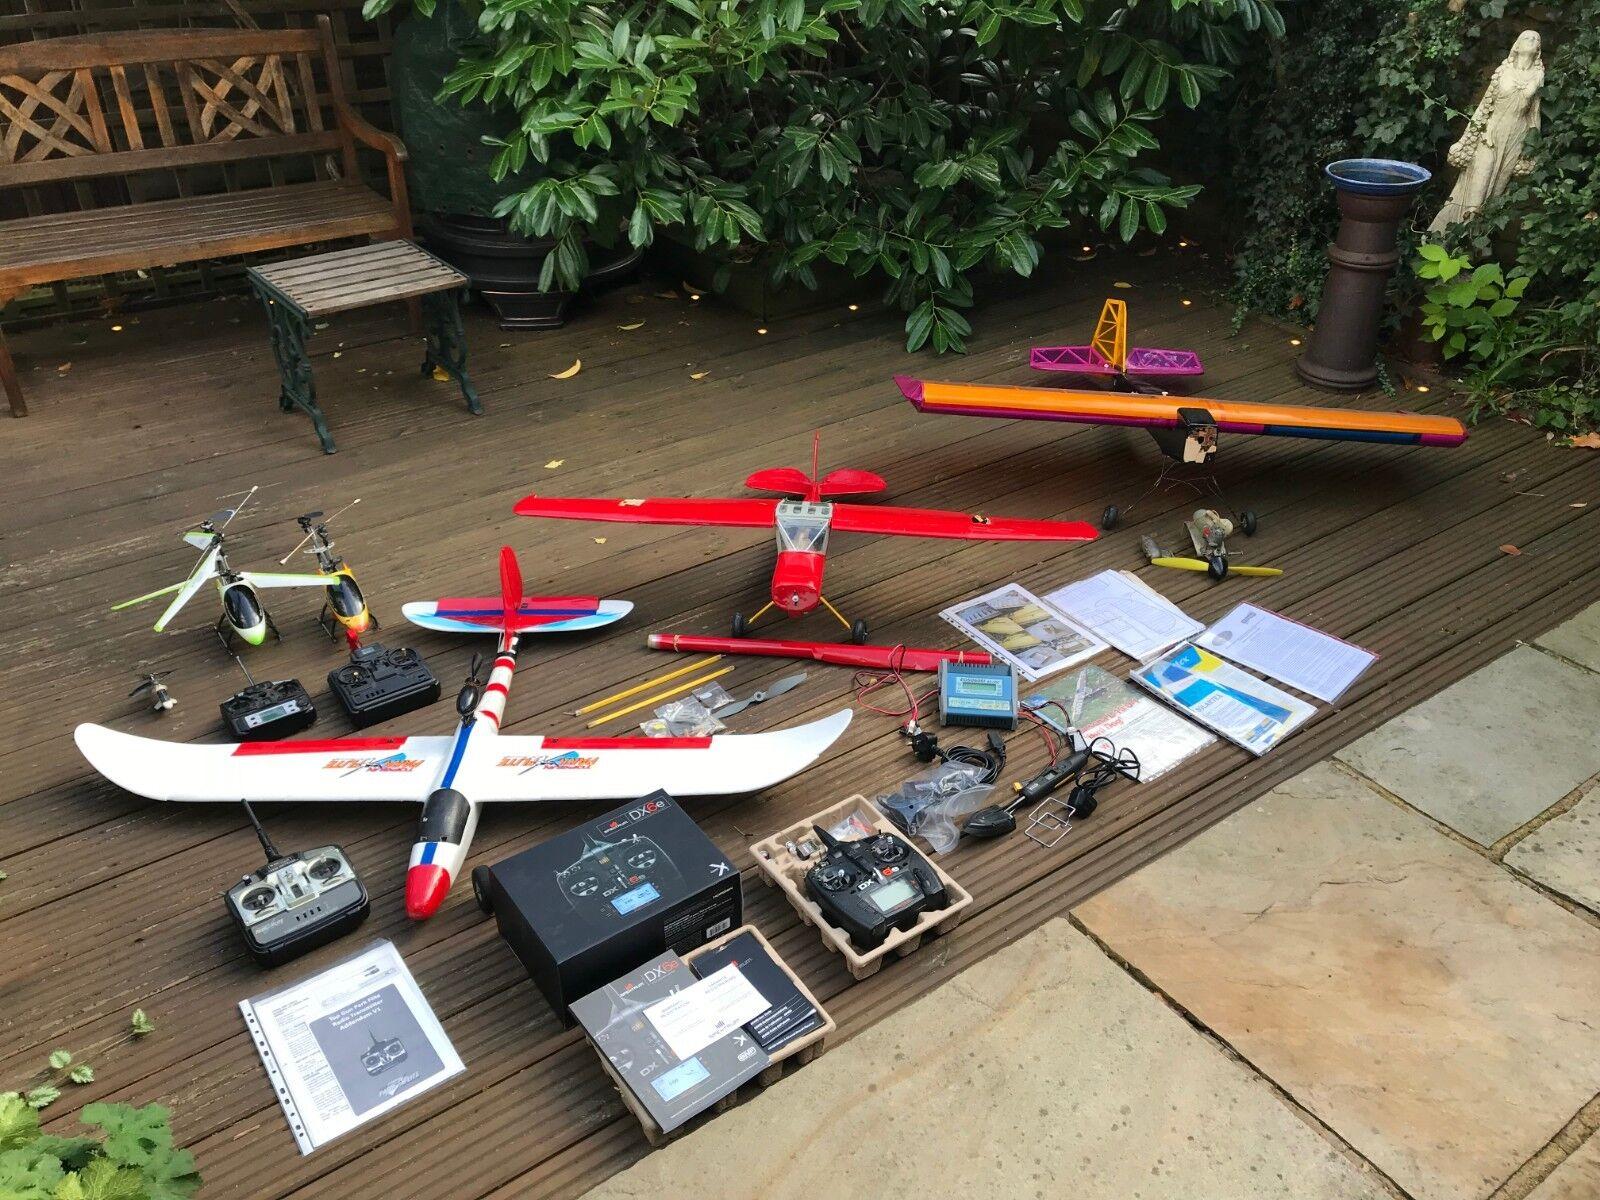 RC JOB LOT BRAND NEW SPEKTRUM DX6E NITRO PLANES HELICOPTER ELECTRIC BIRD DOG L19